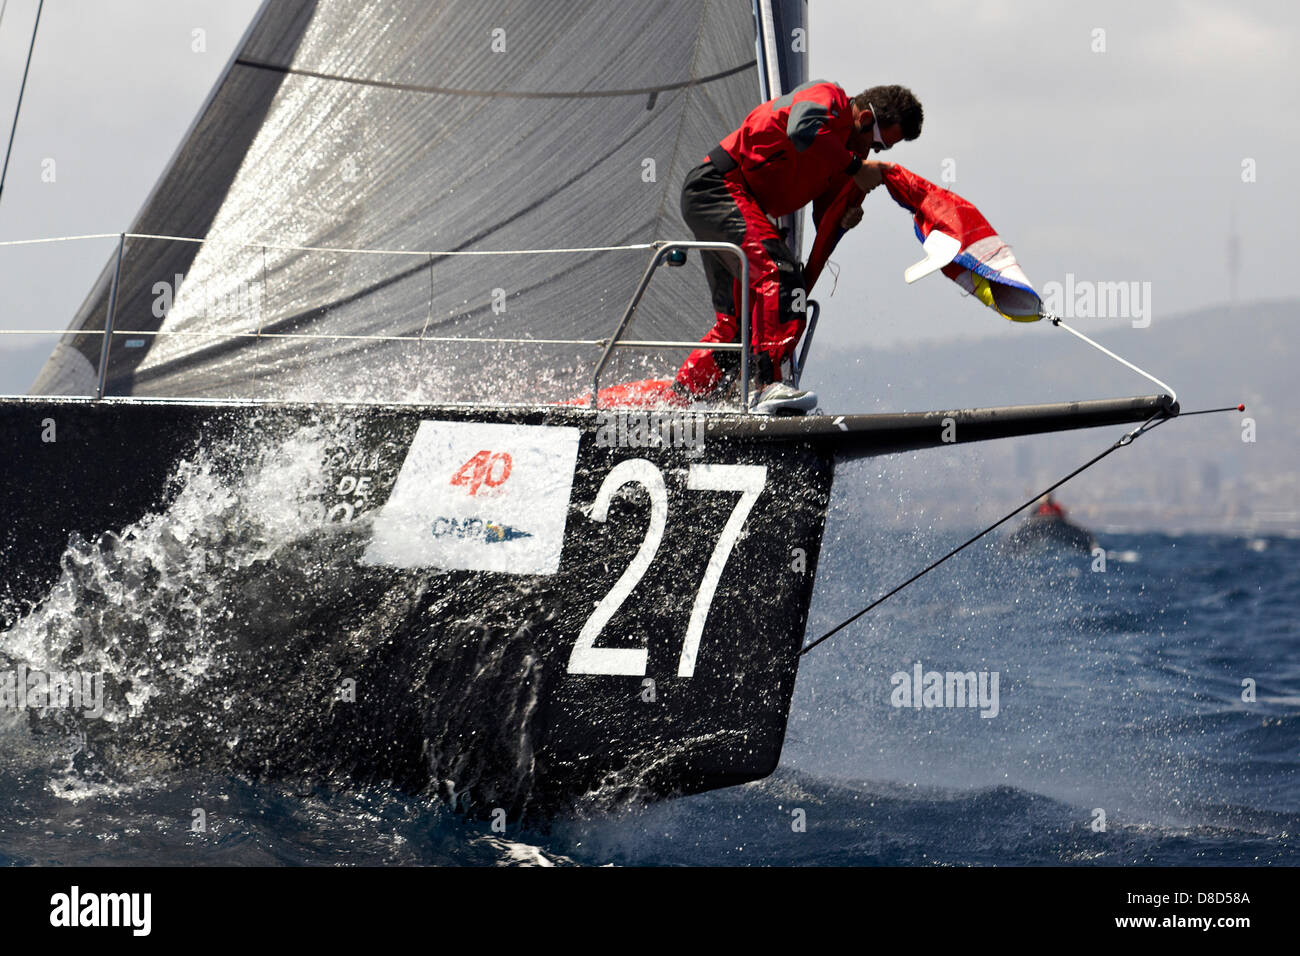 25 05 2013 Barcelona, Spain  Soto 40, Black Pearl in action